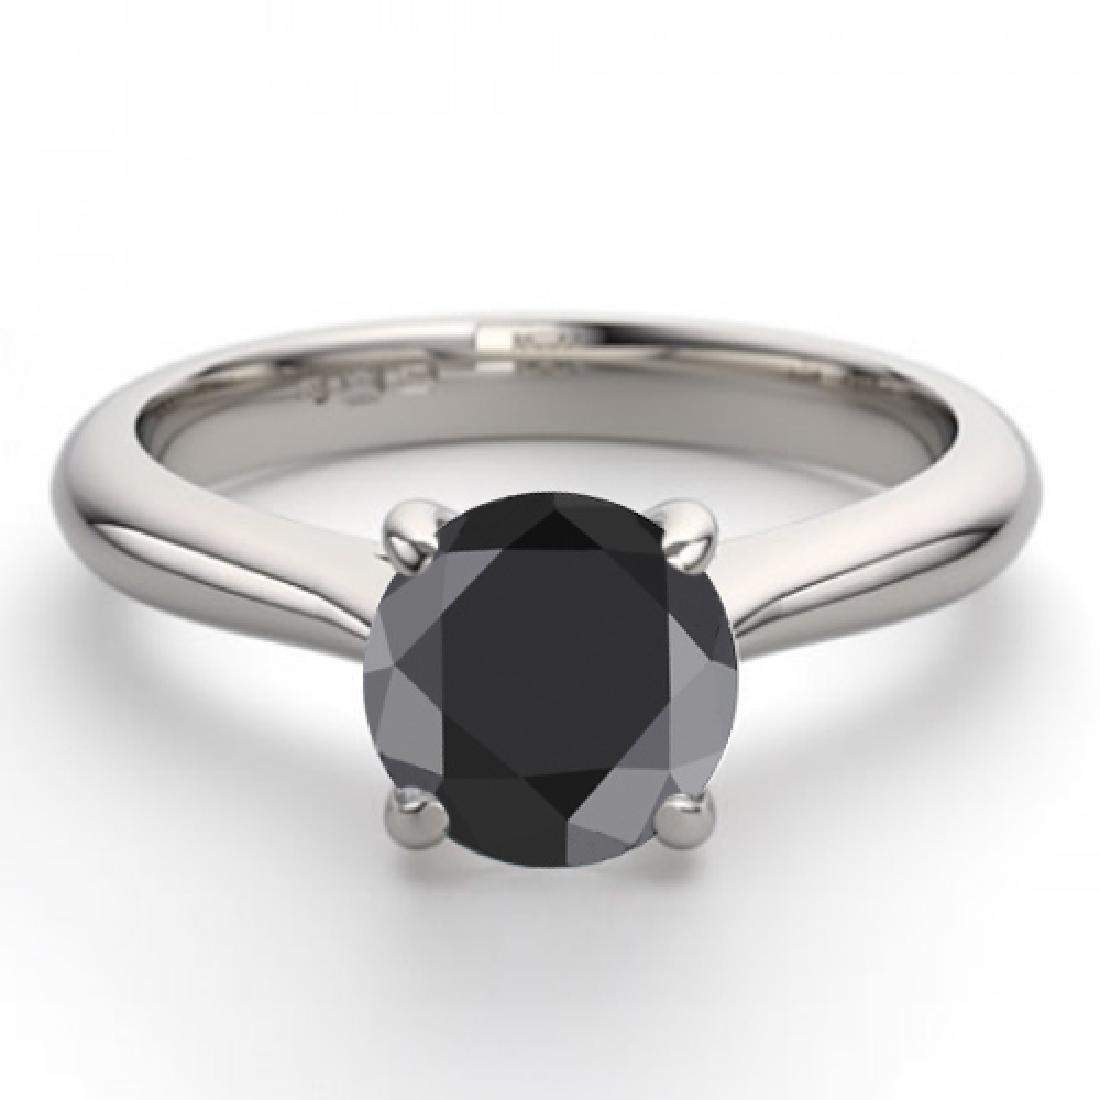 14K White Gold Jewelry 1.41 ctw Black Diamond Solitaire